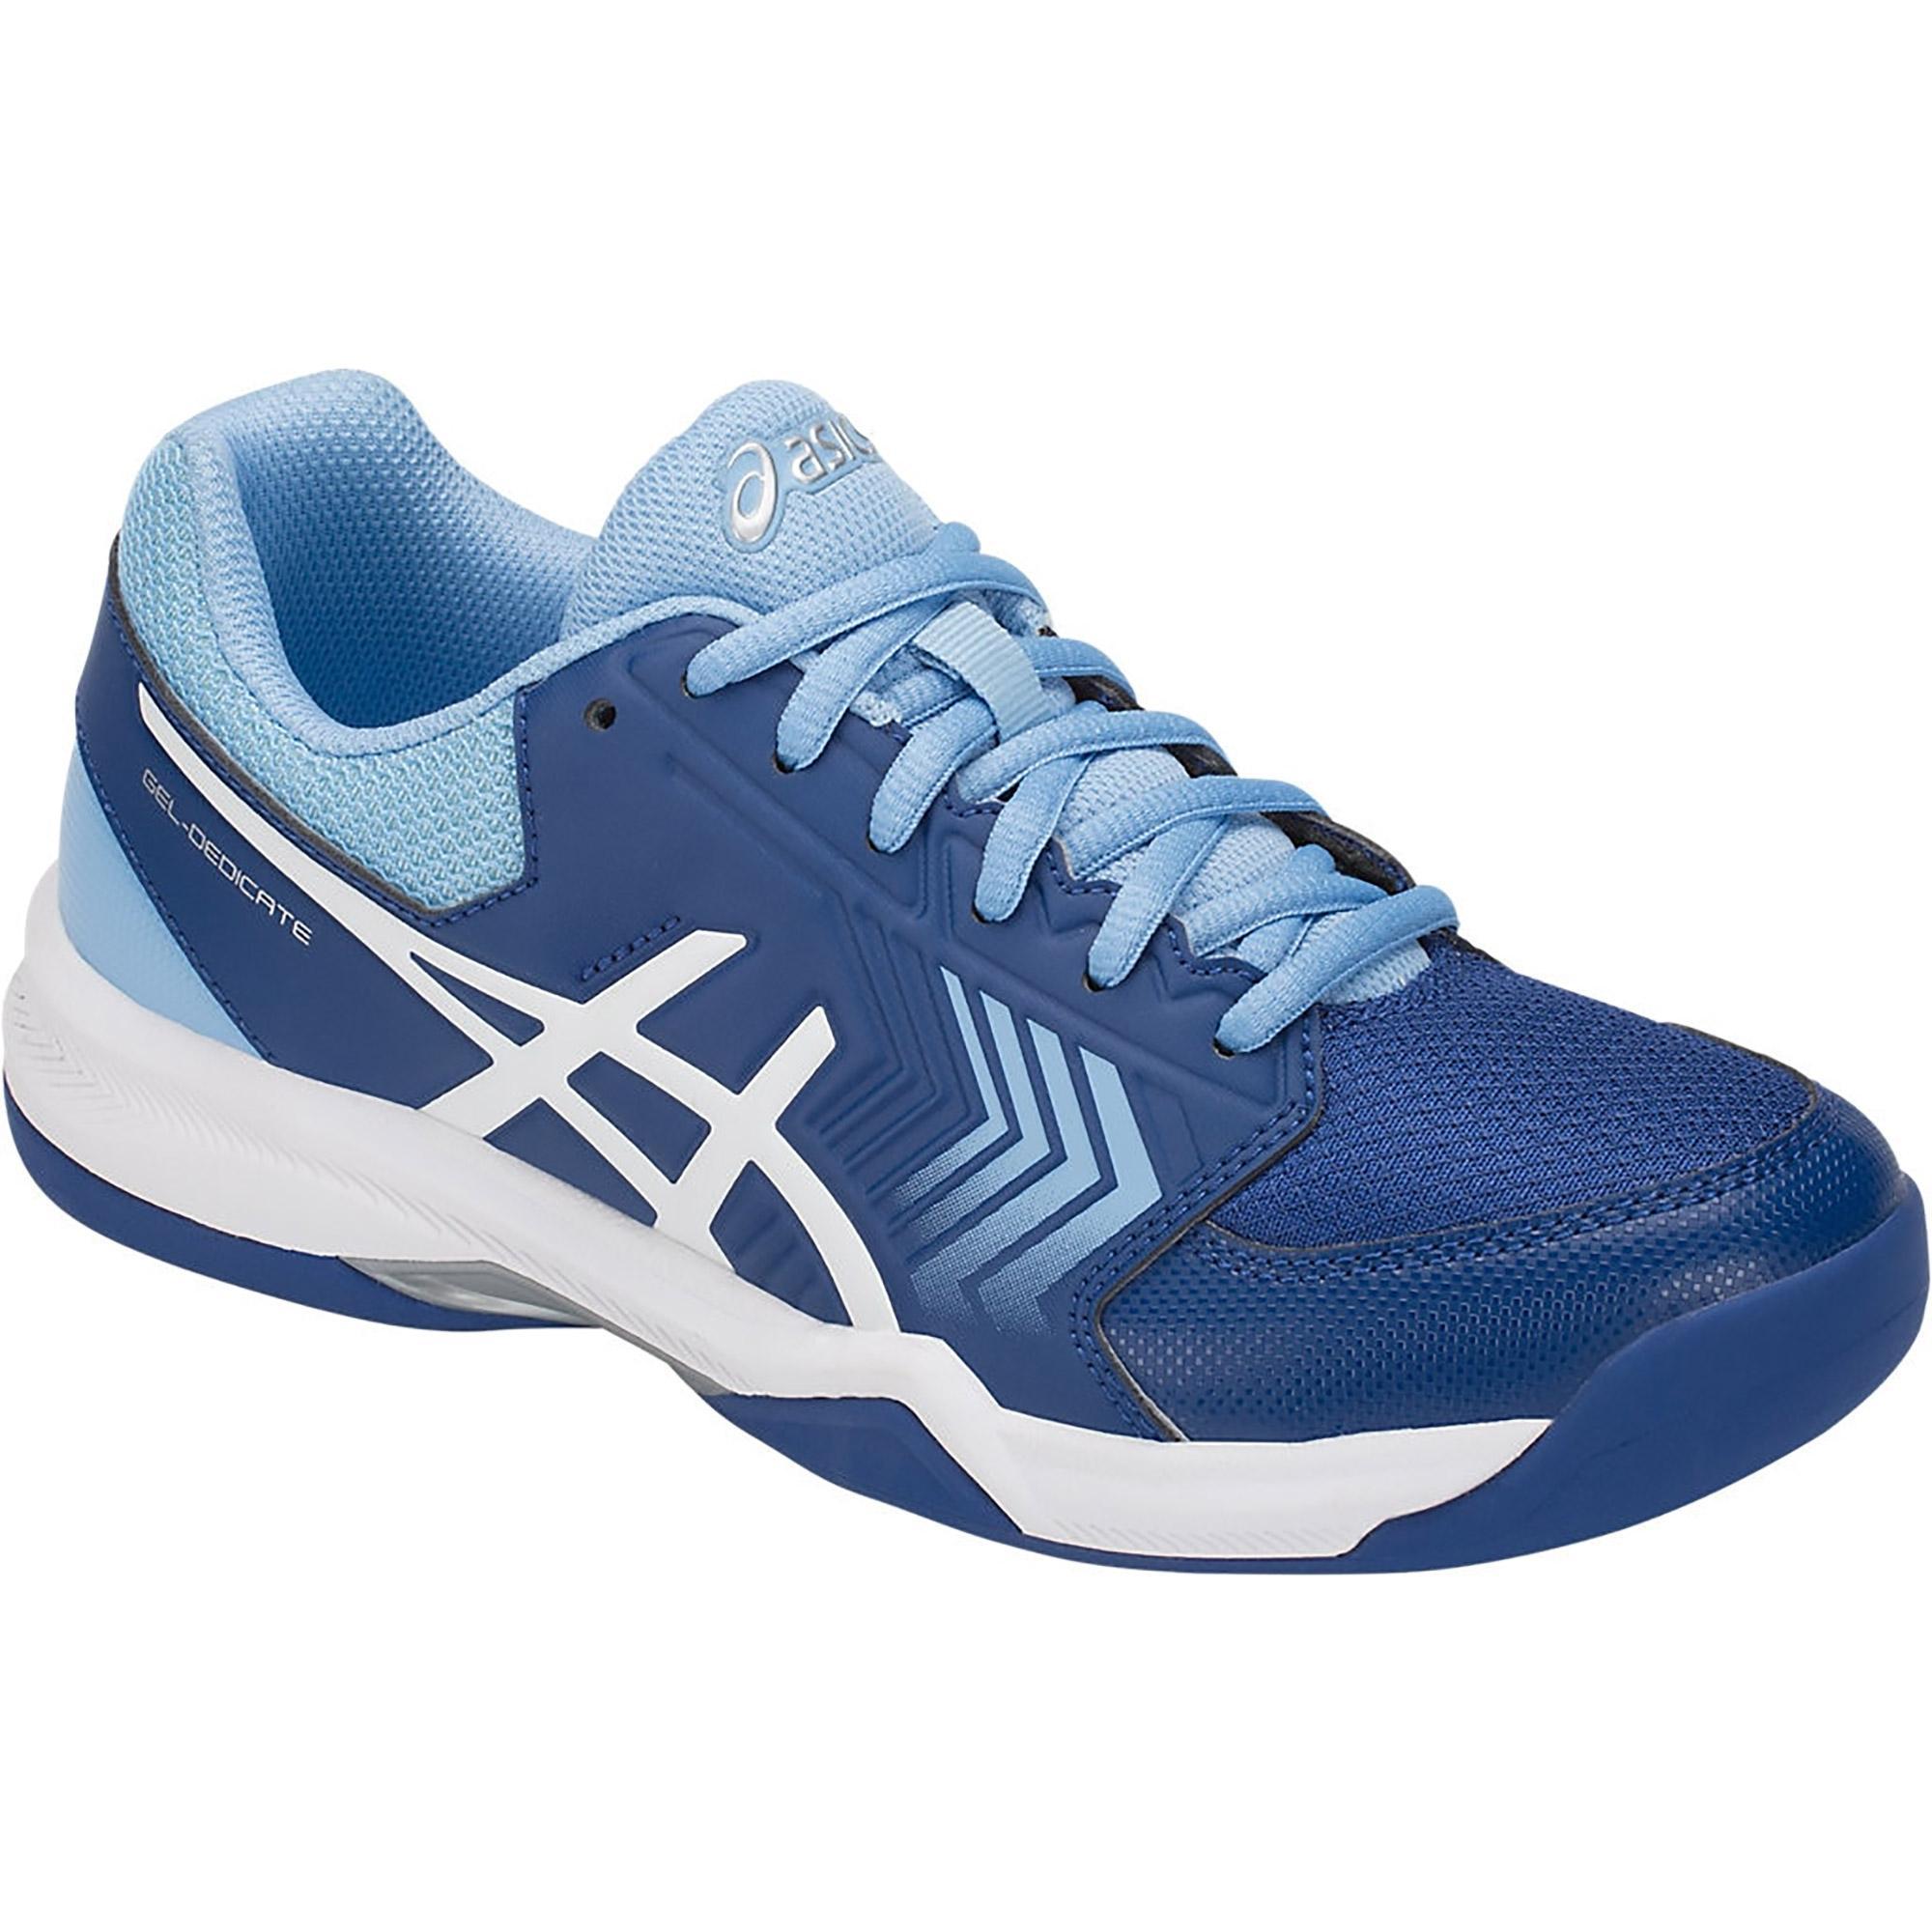 229a6789cd442a Asics Womens GEL-Dedicate 5 Carpet Tennis Shoes - Monaco Blue/White ...